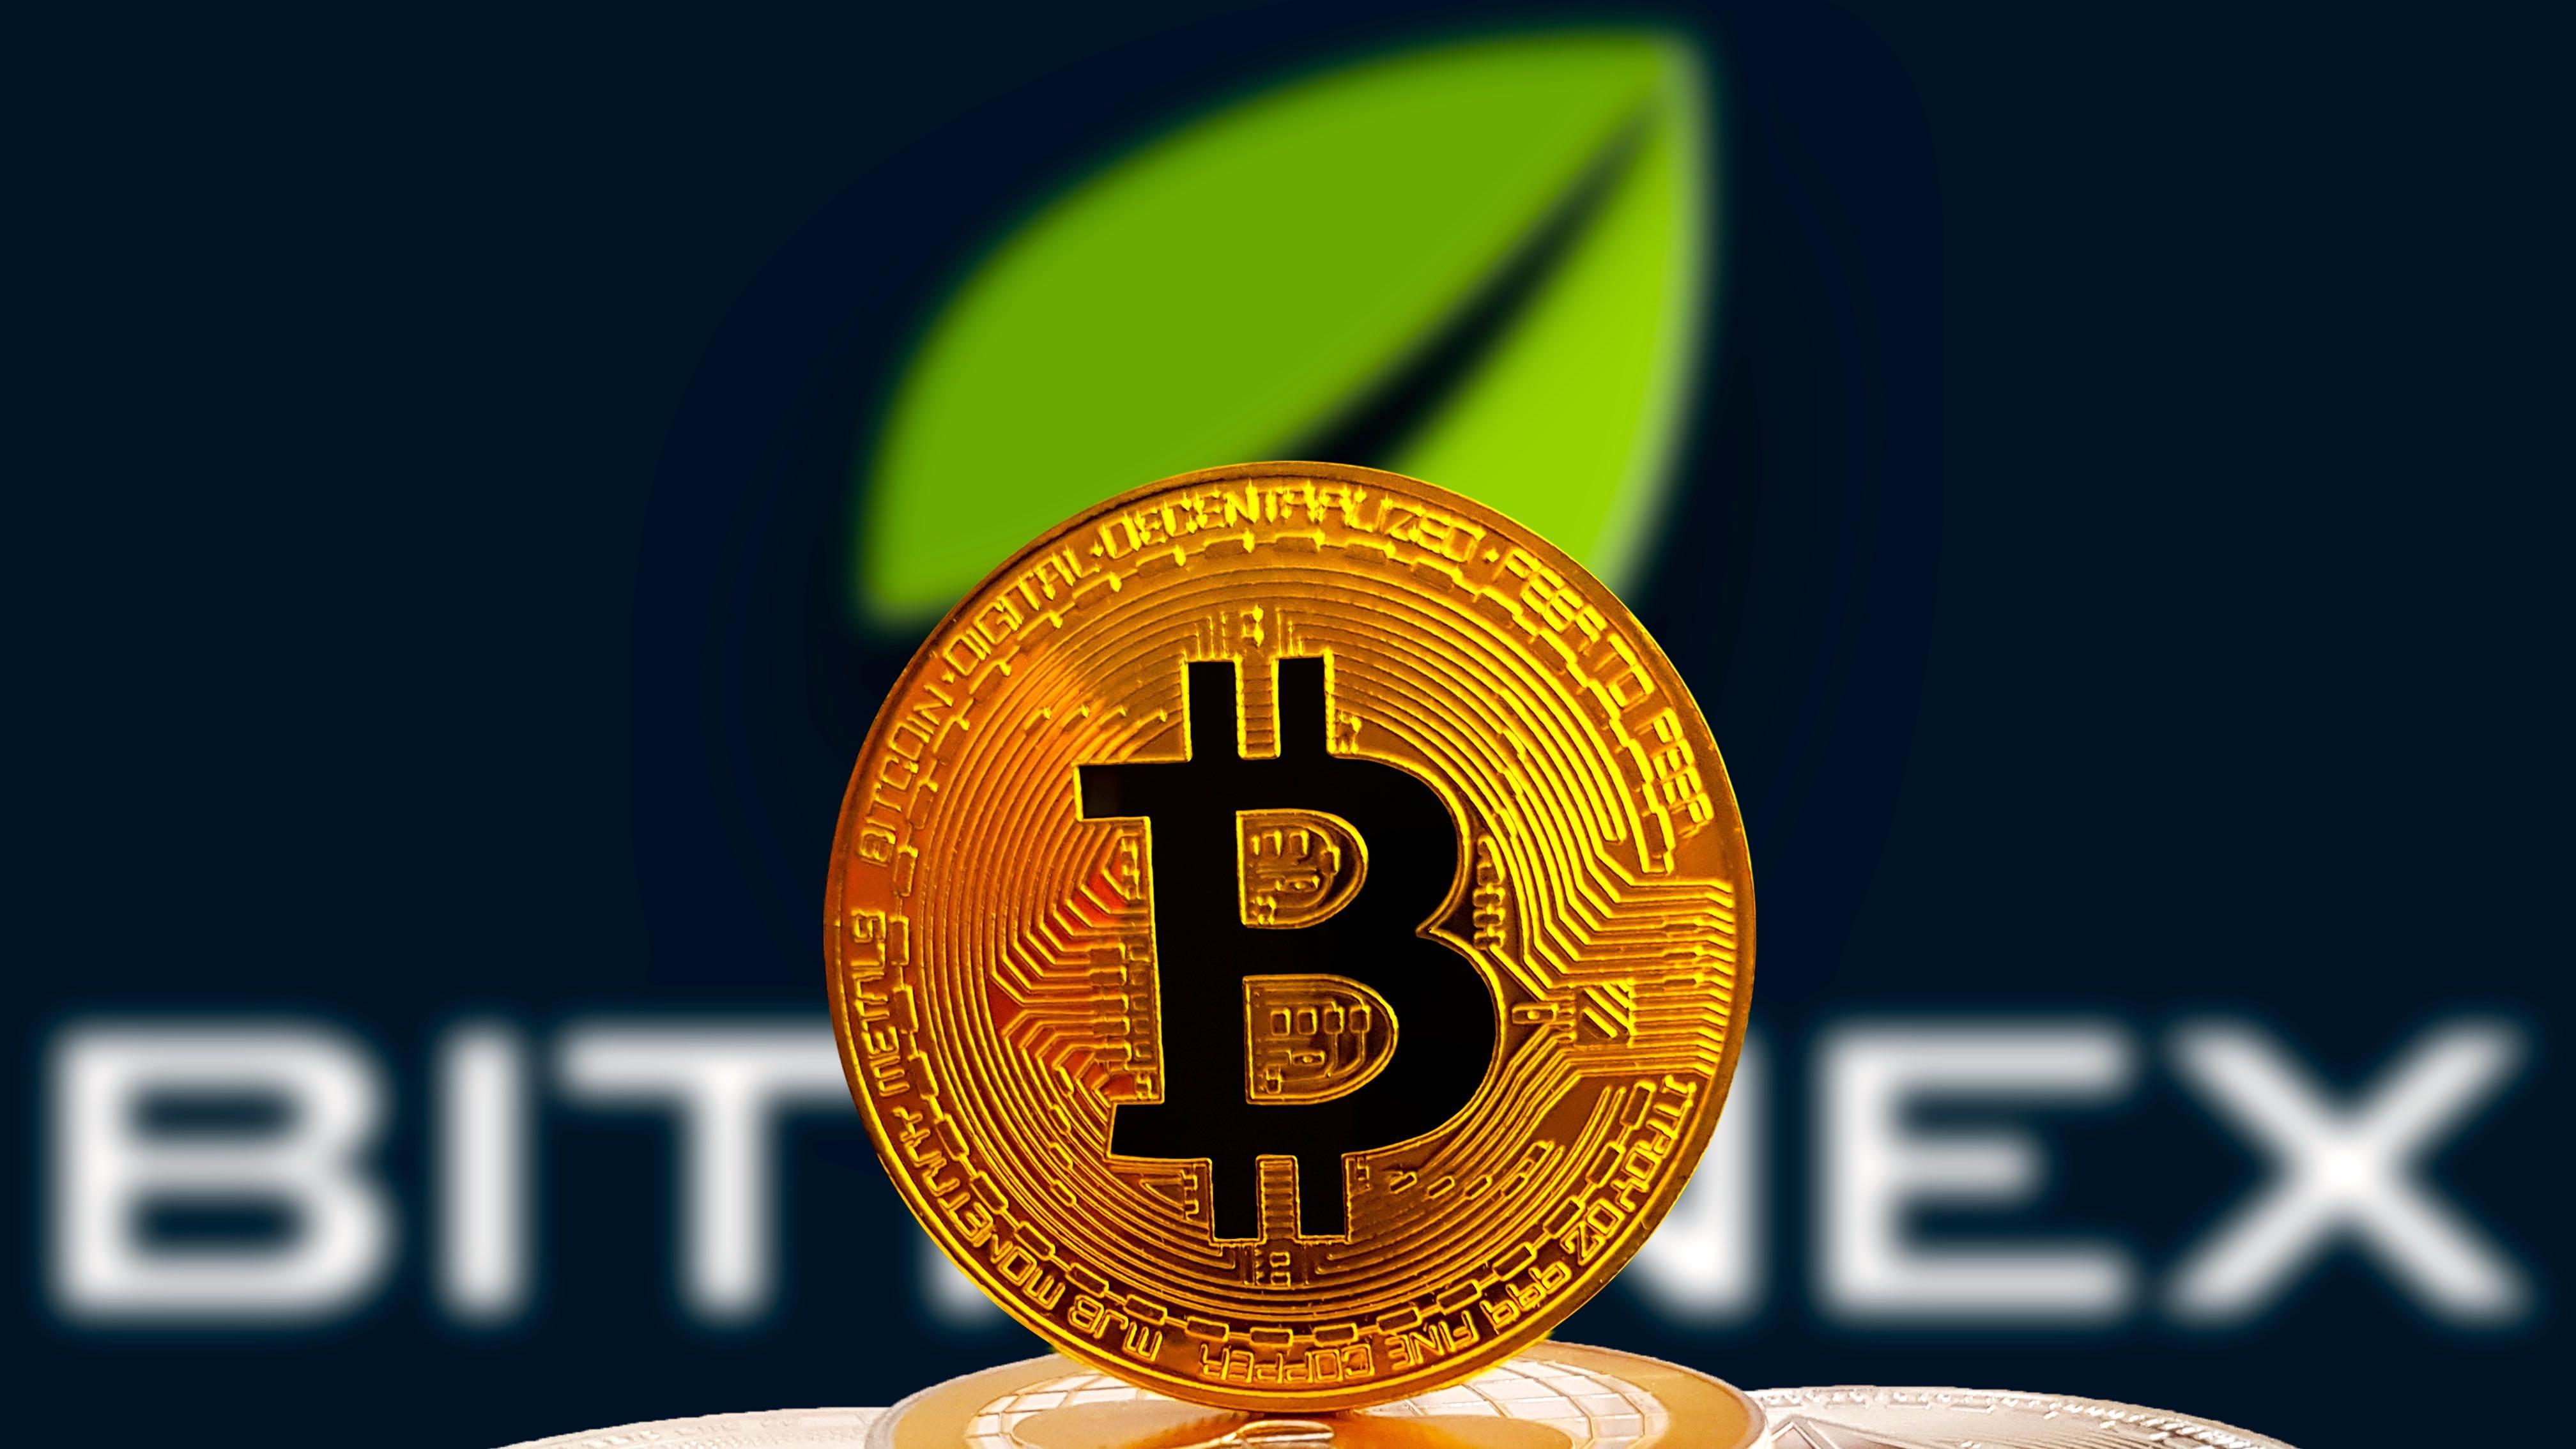 New report ties recent Bitcoin price jump to Bitfinex